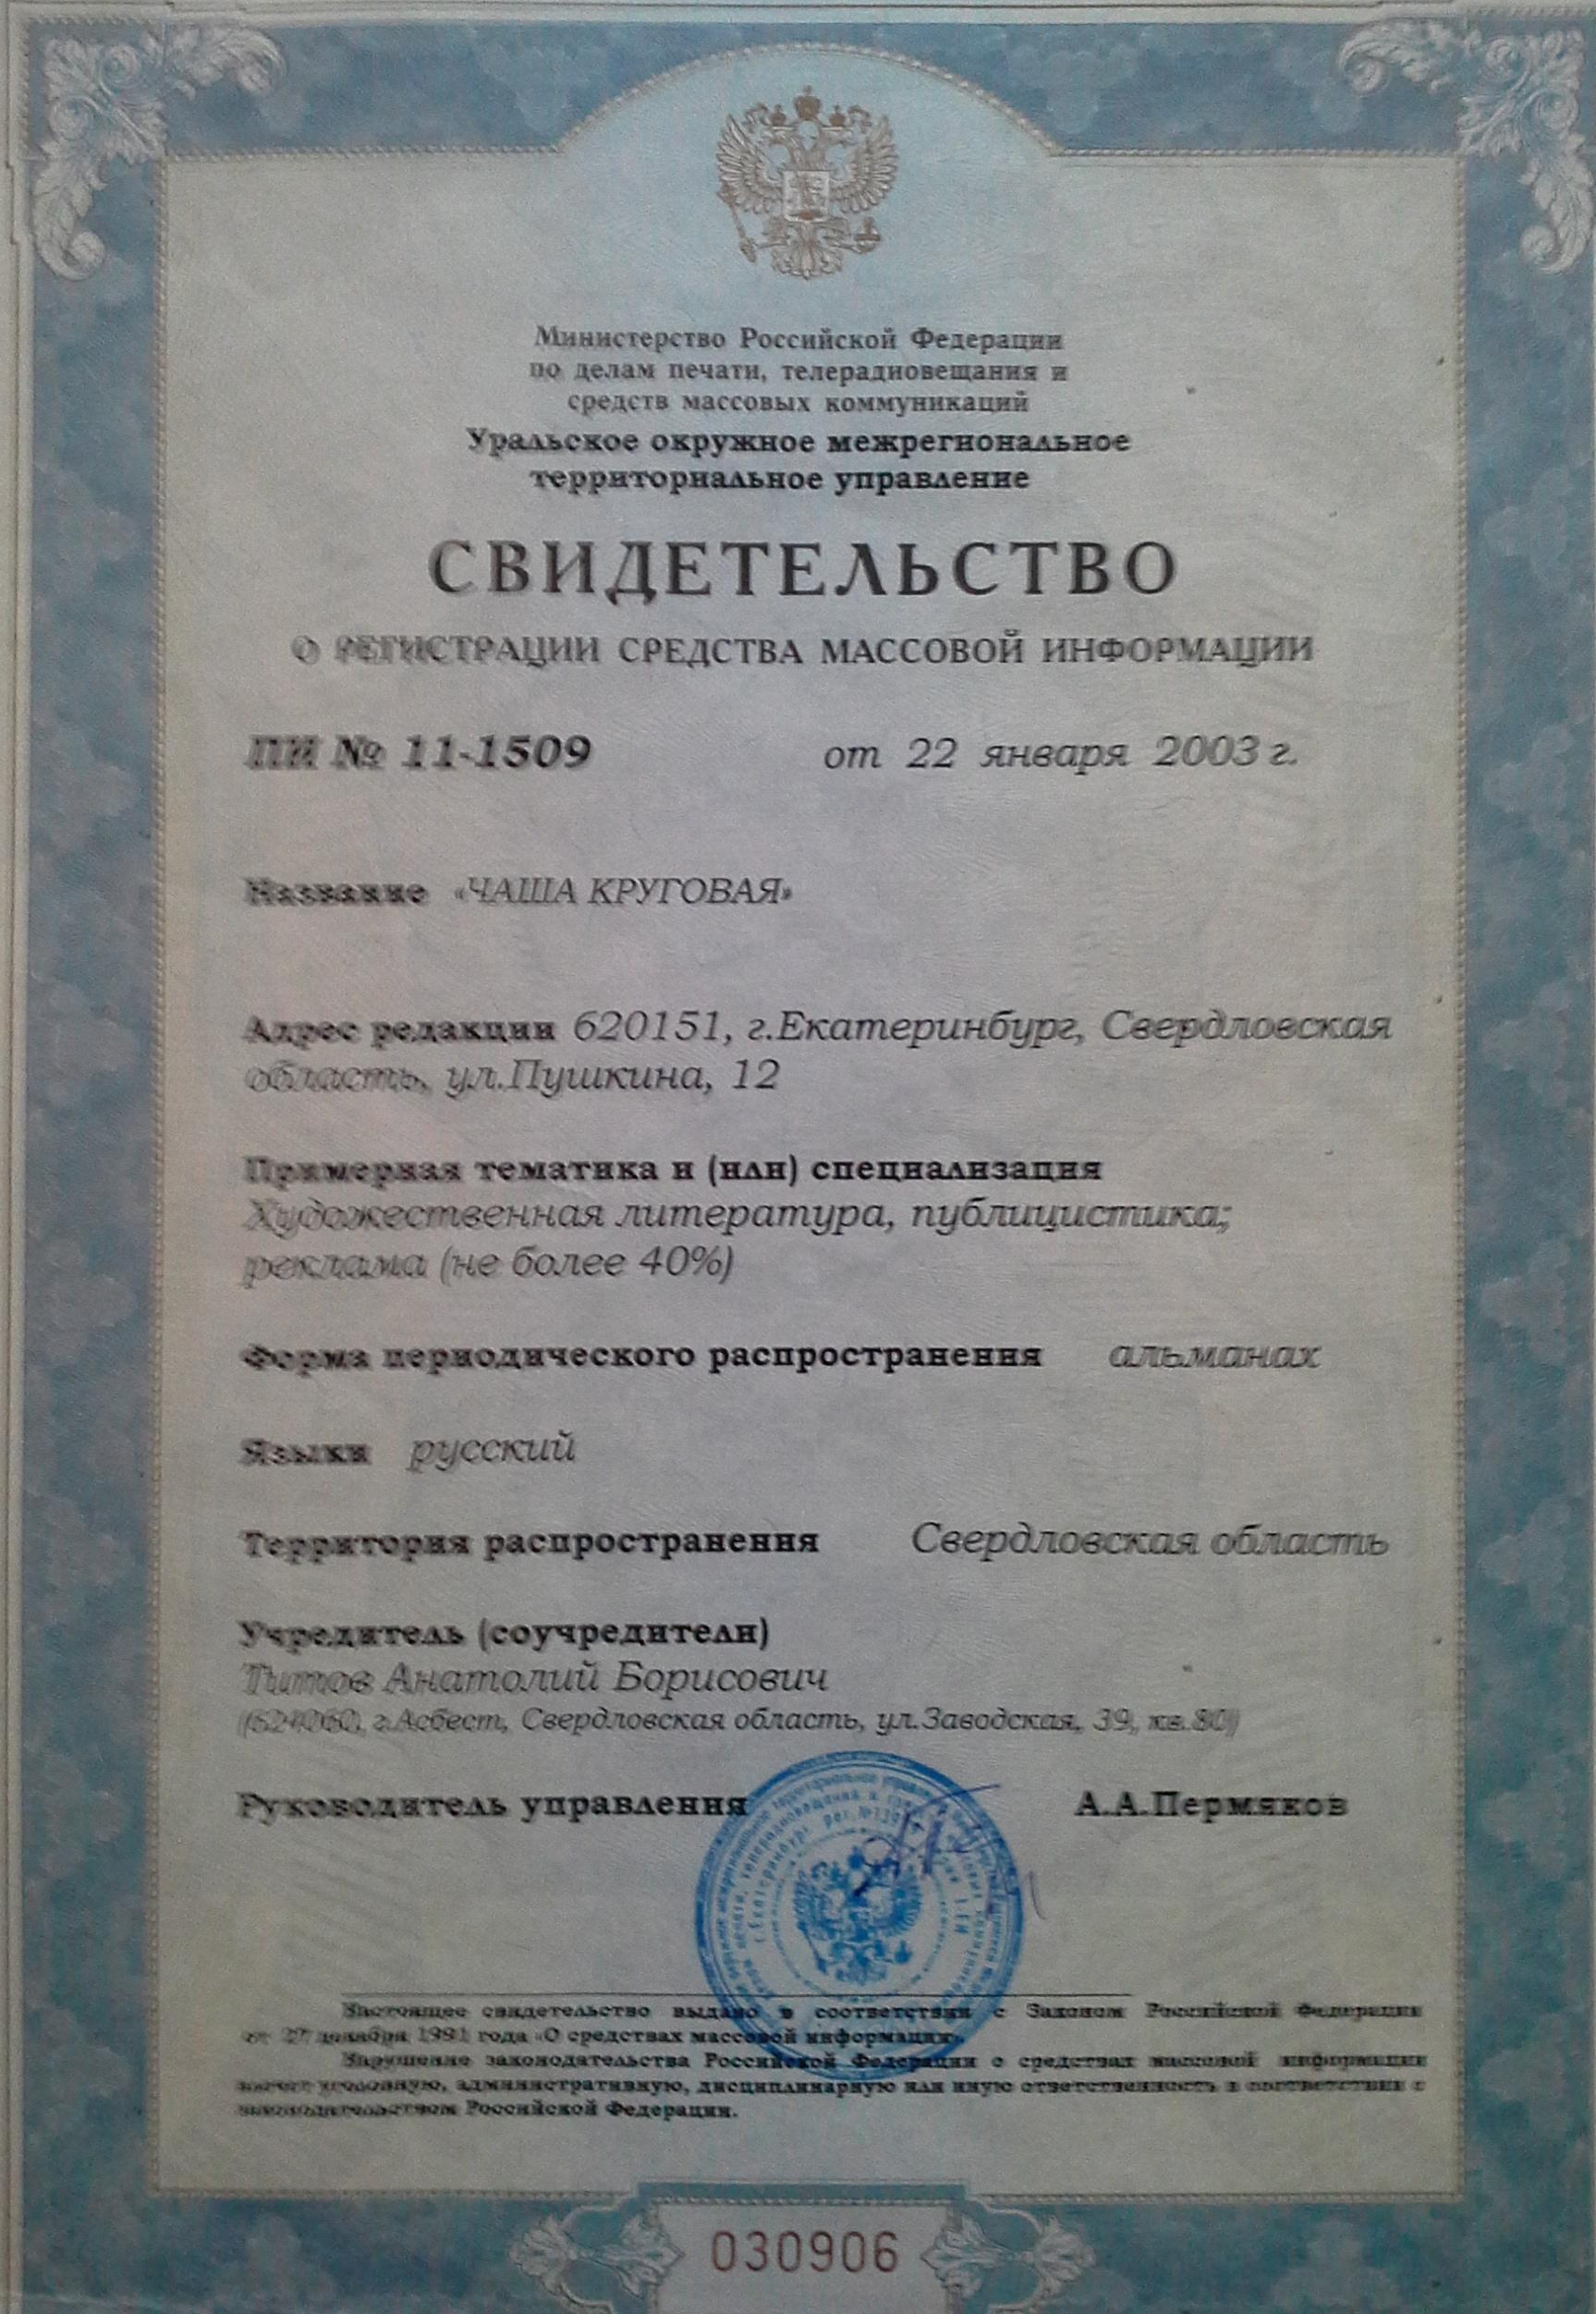 chasha-krugovaya-reg